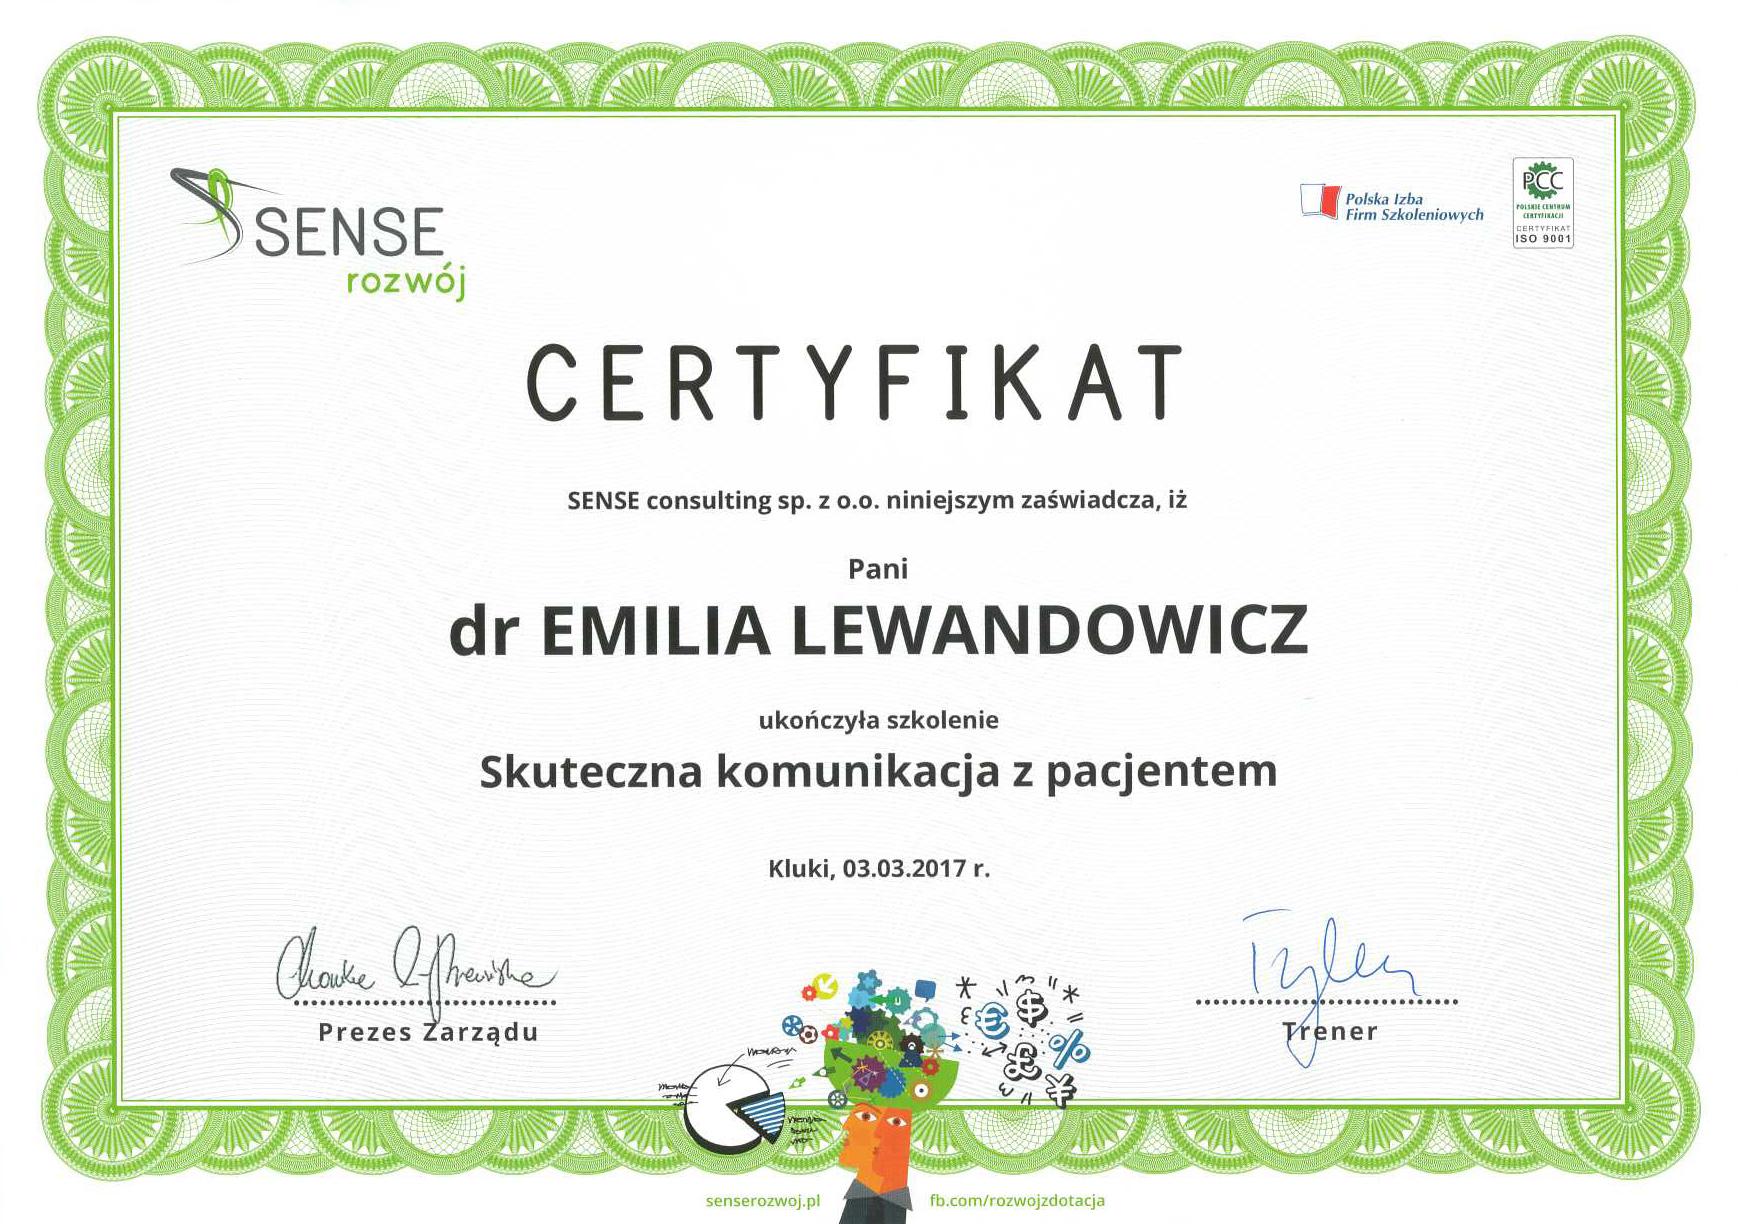 Cert Komunikacja2017 Emi - dr n. med. Michał Lewandowicz